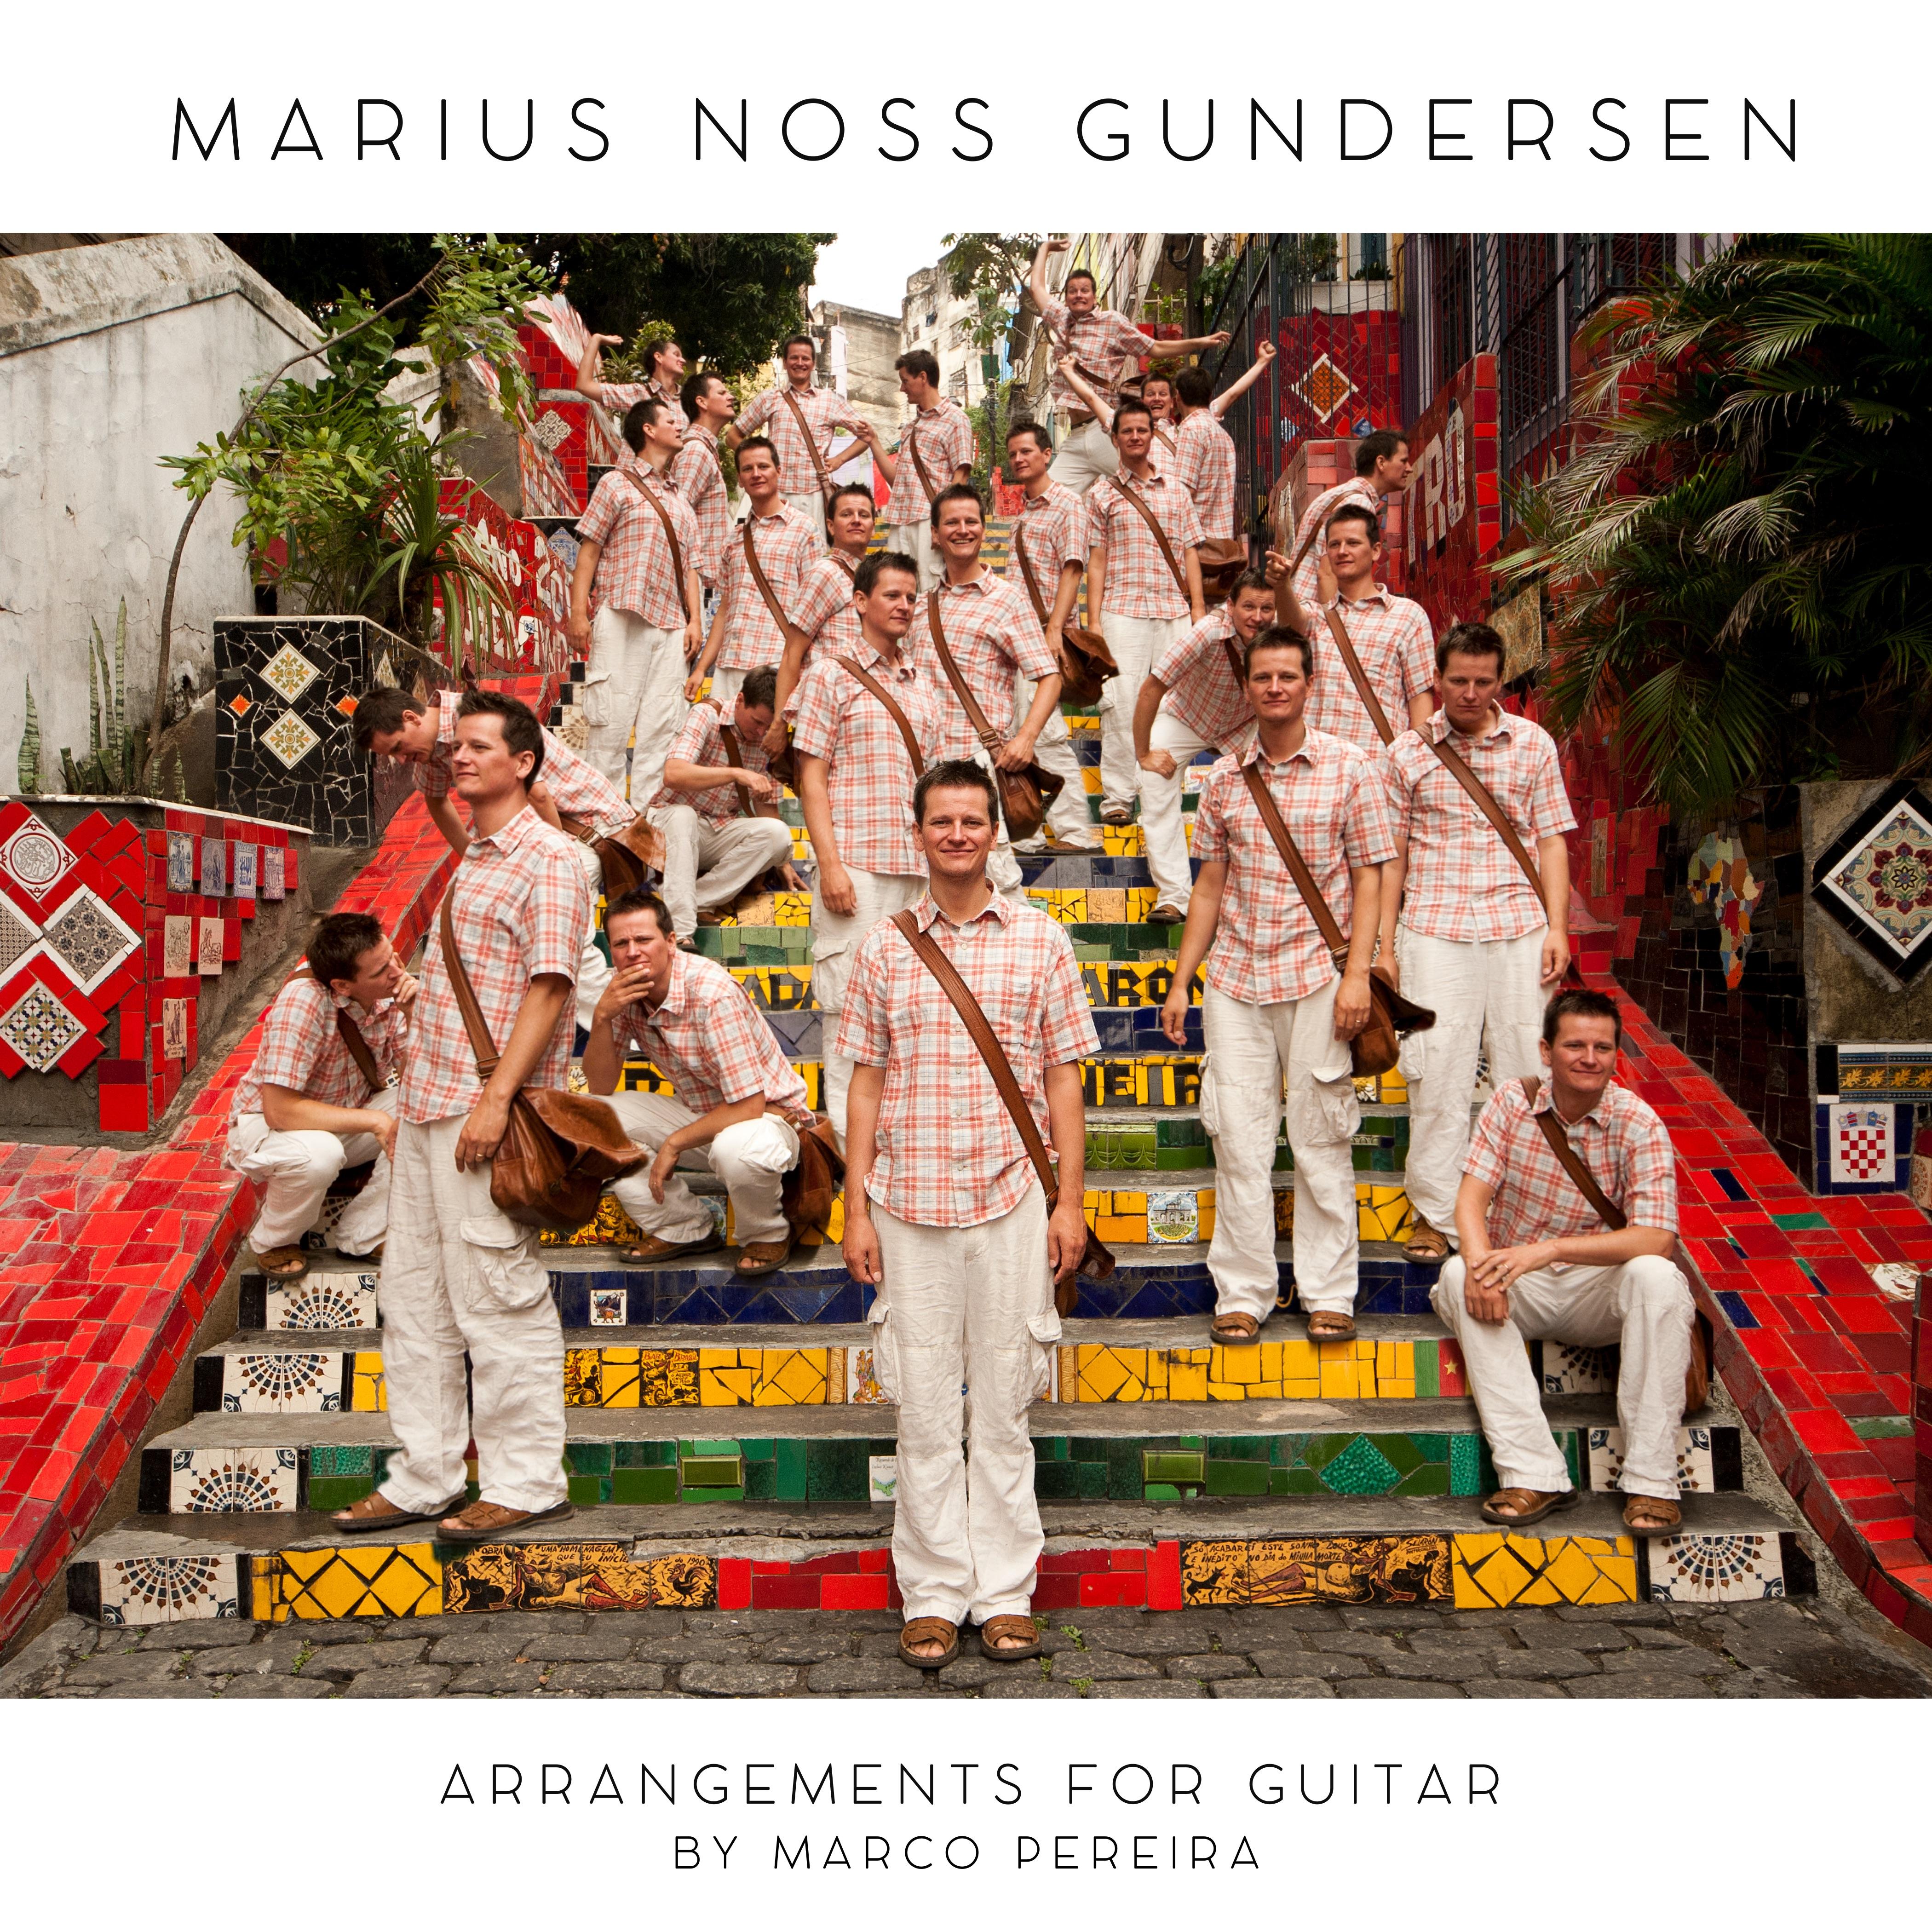 MARIUS GUNDERSEN - Arrangements For Guitar By Marco Pereira cover